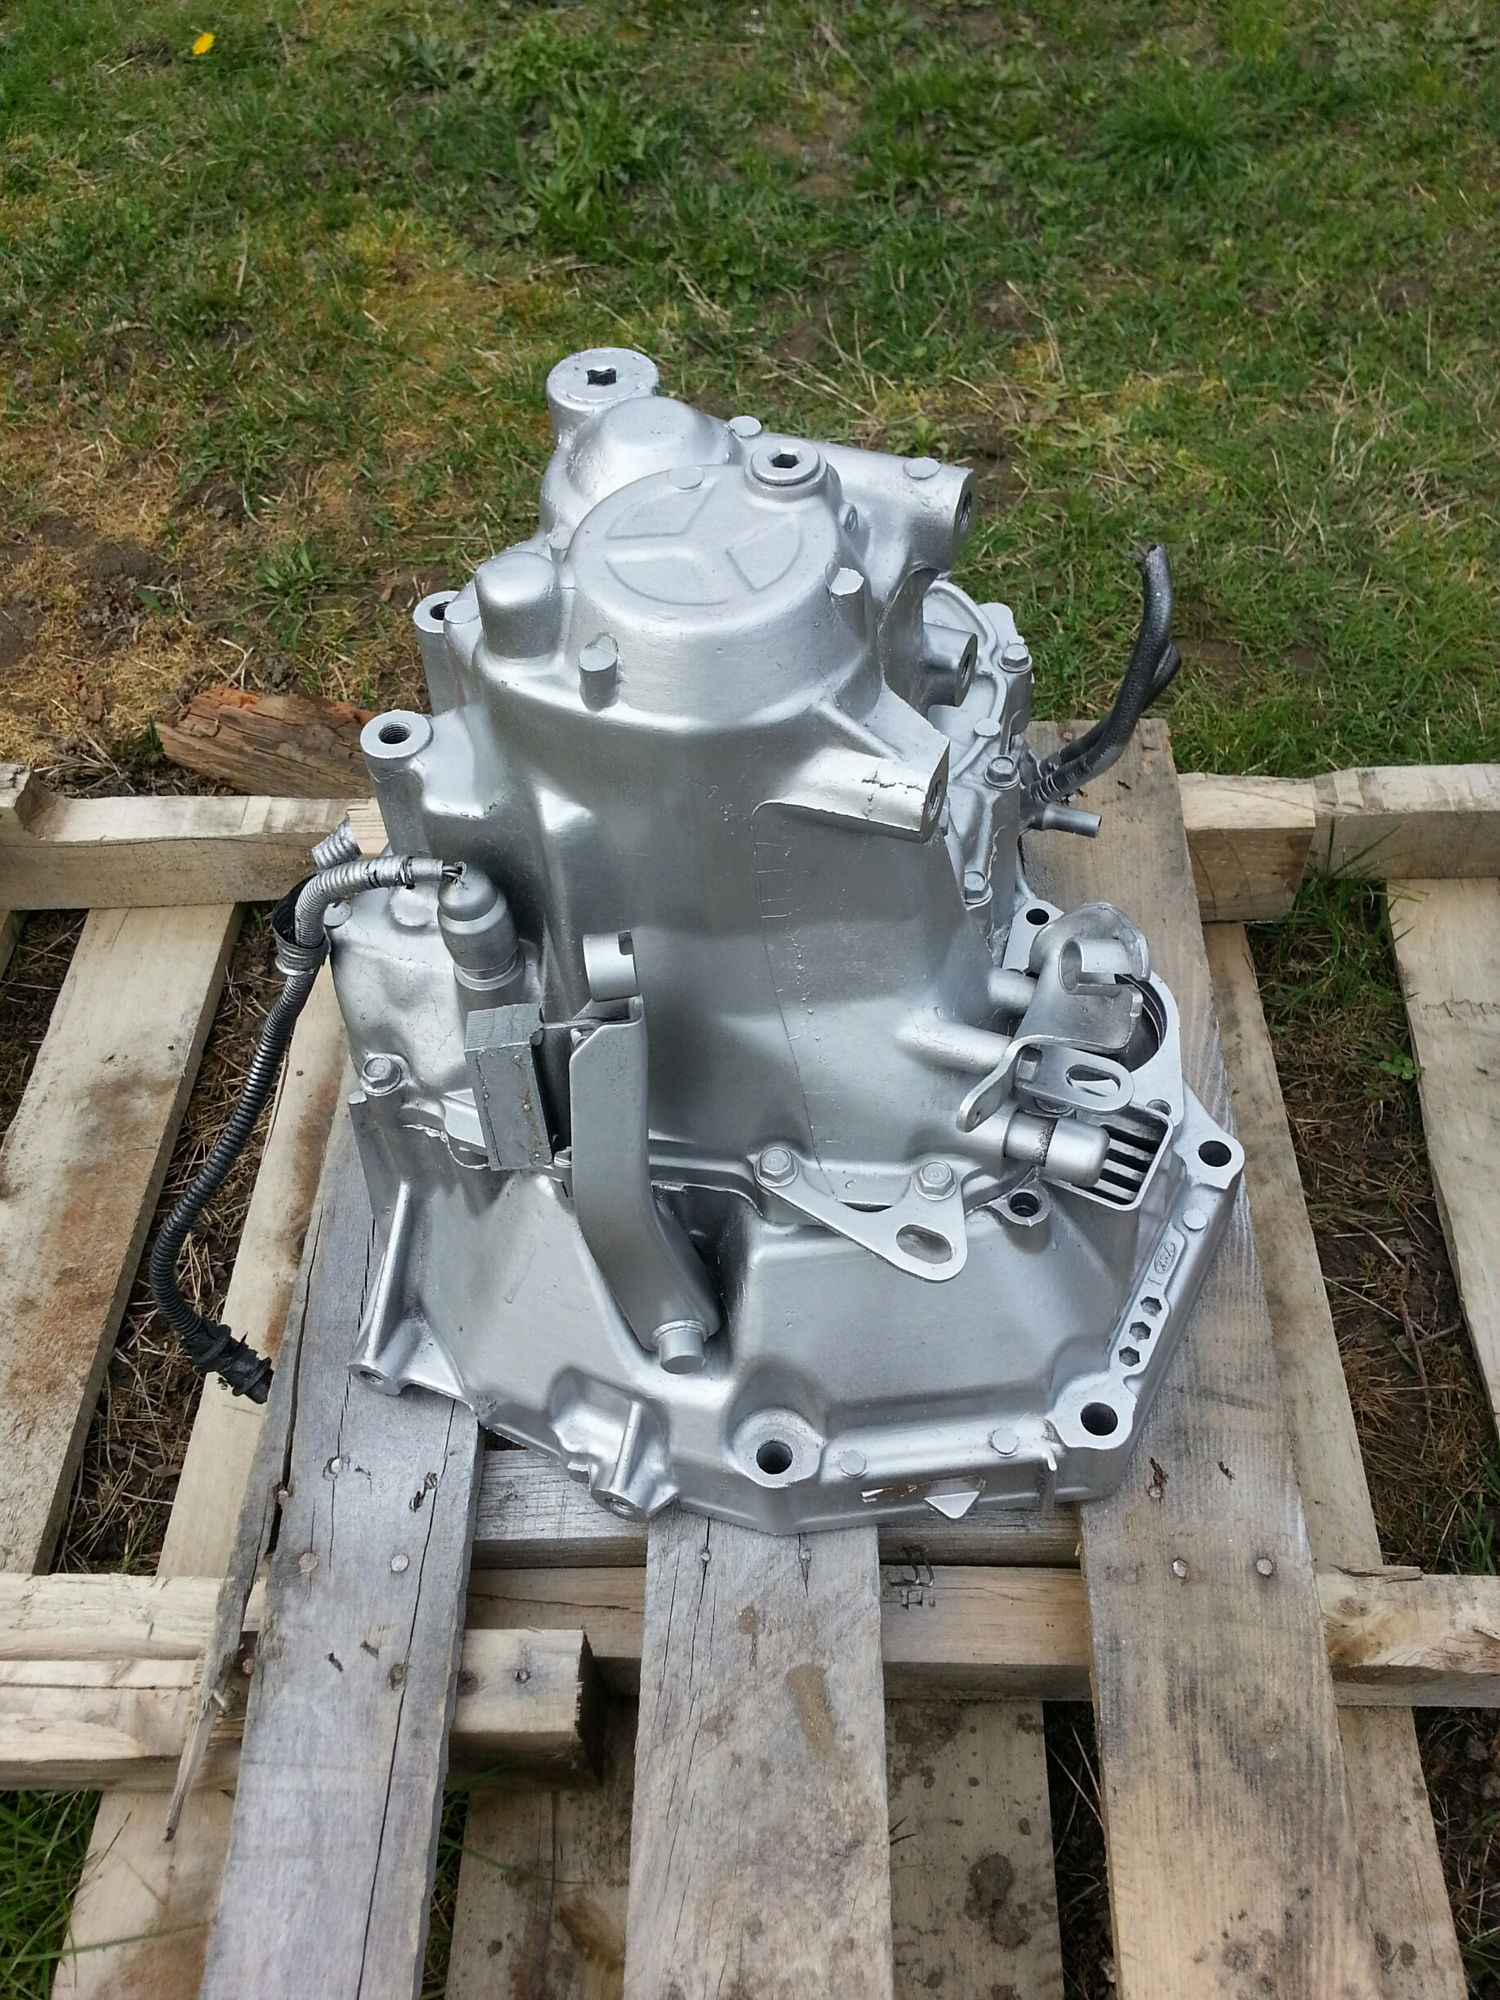 Y1 b16 transmission for sale